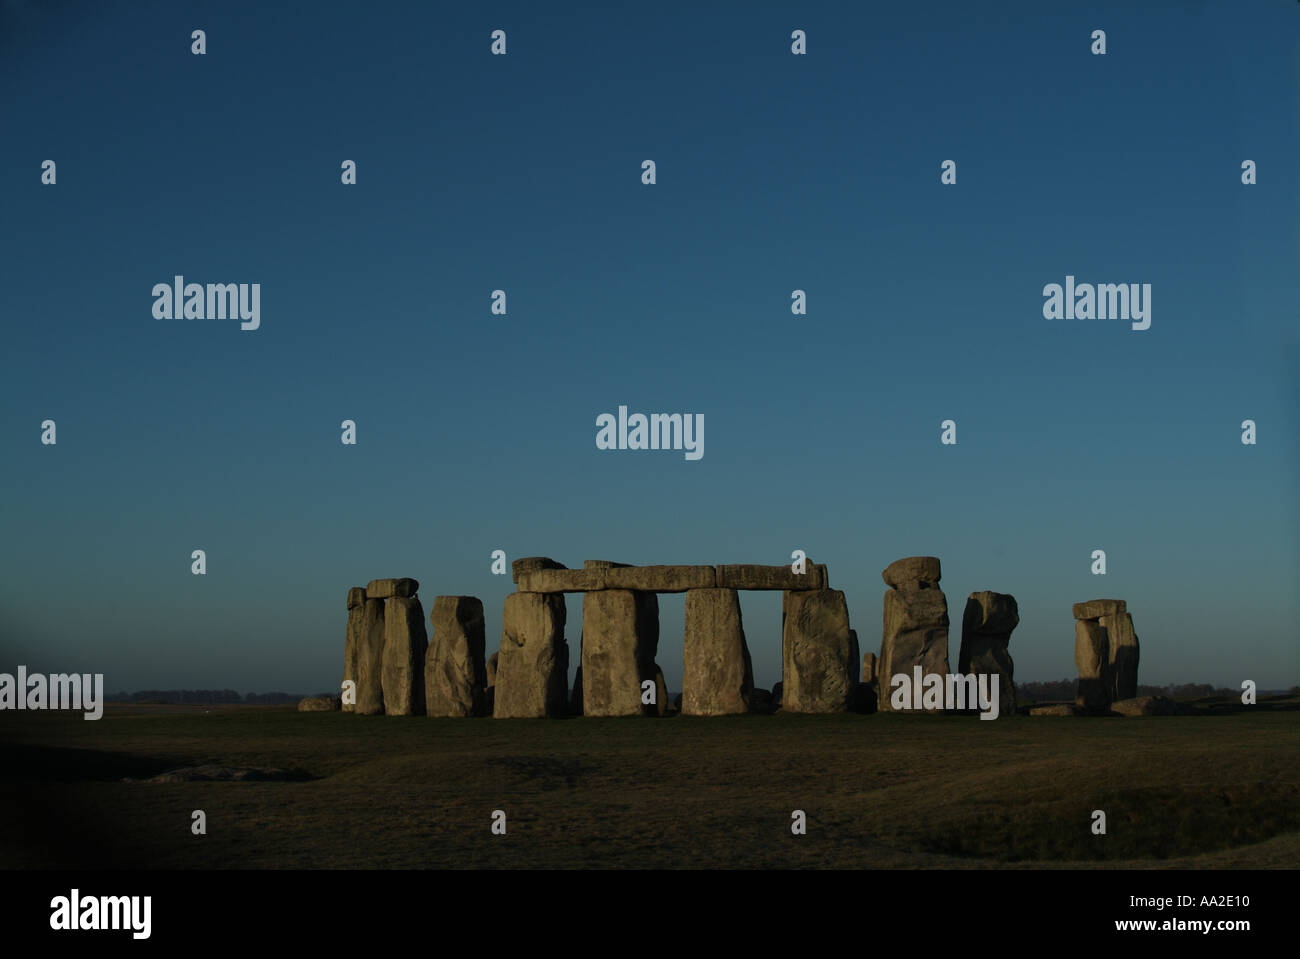 Totale, Stonehenge, Wiltshire Stockbild